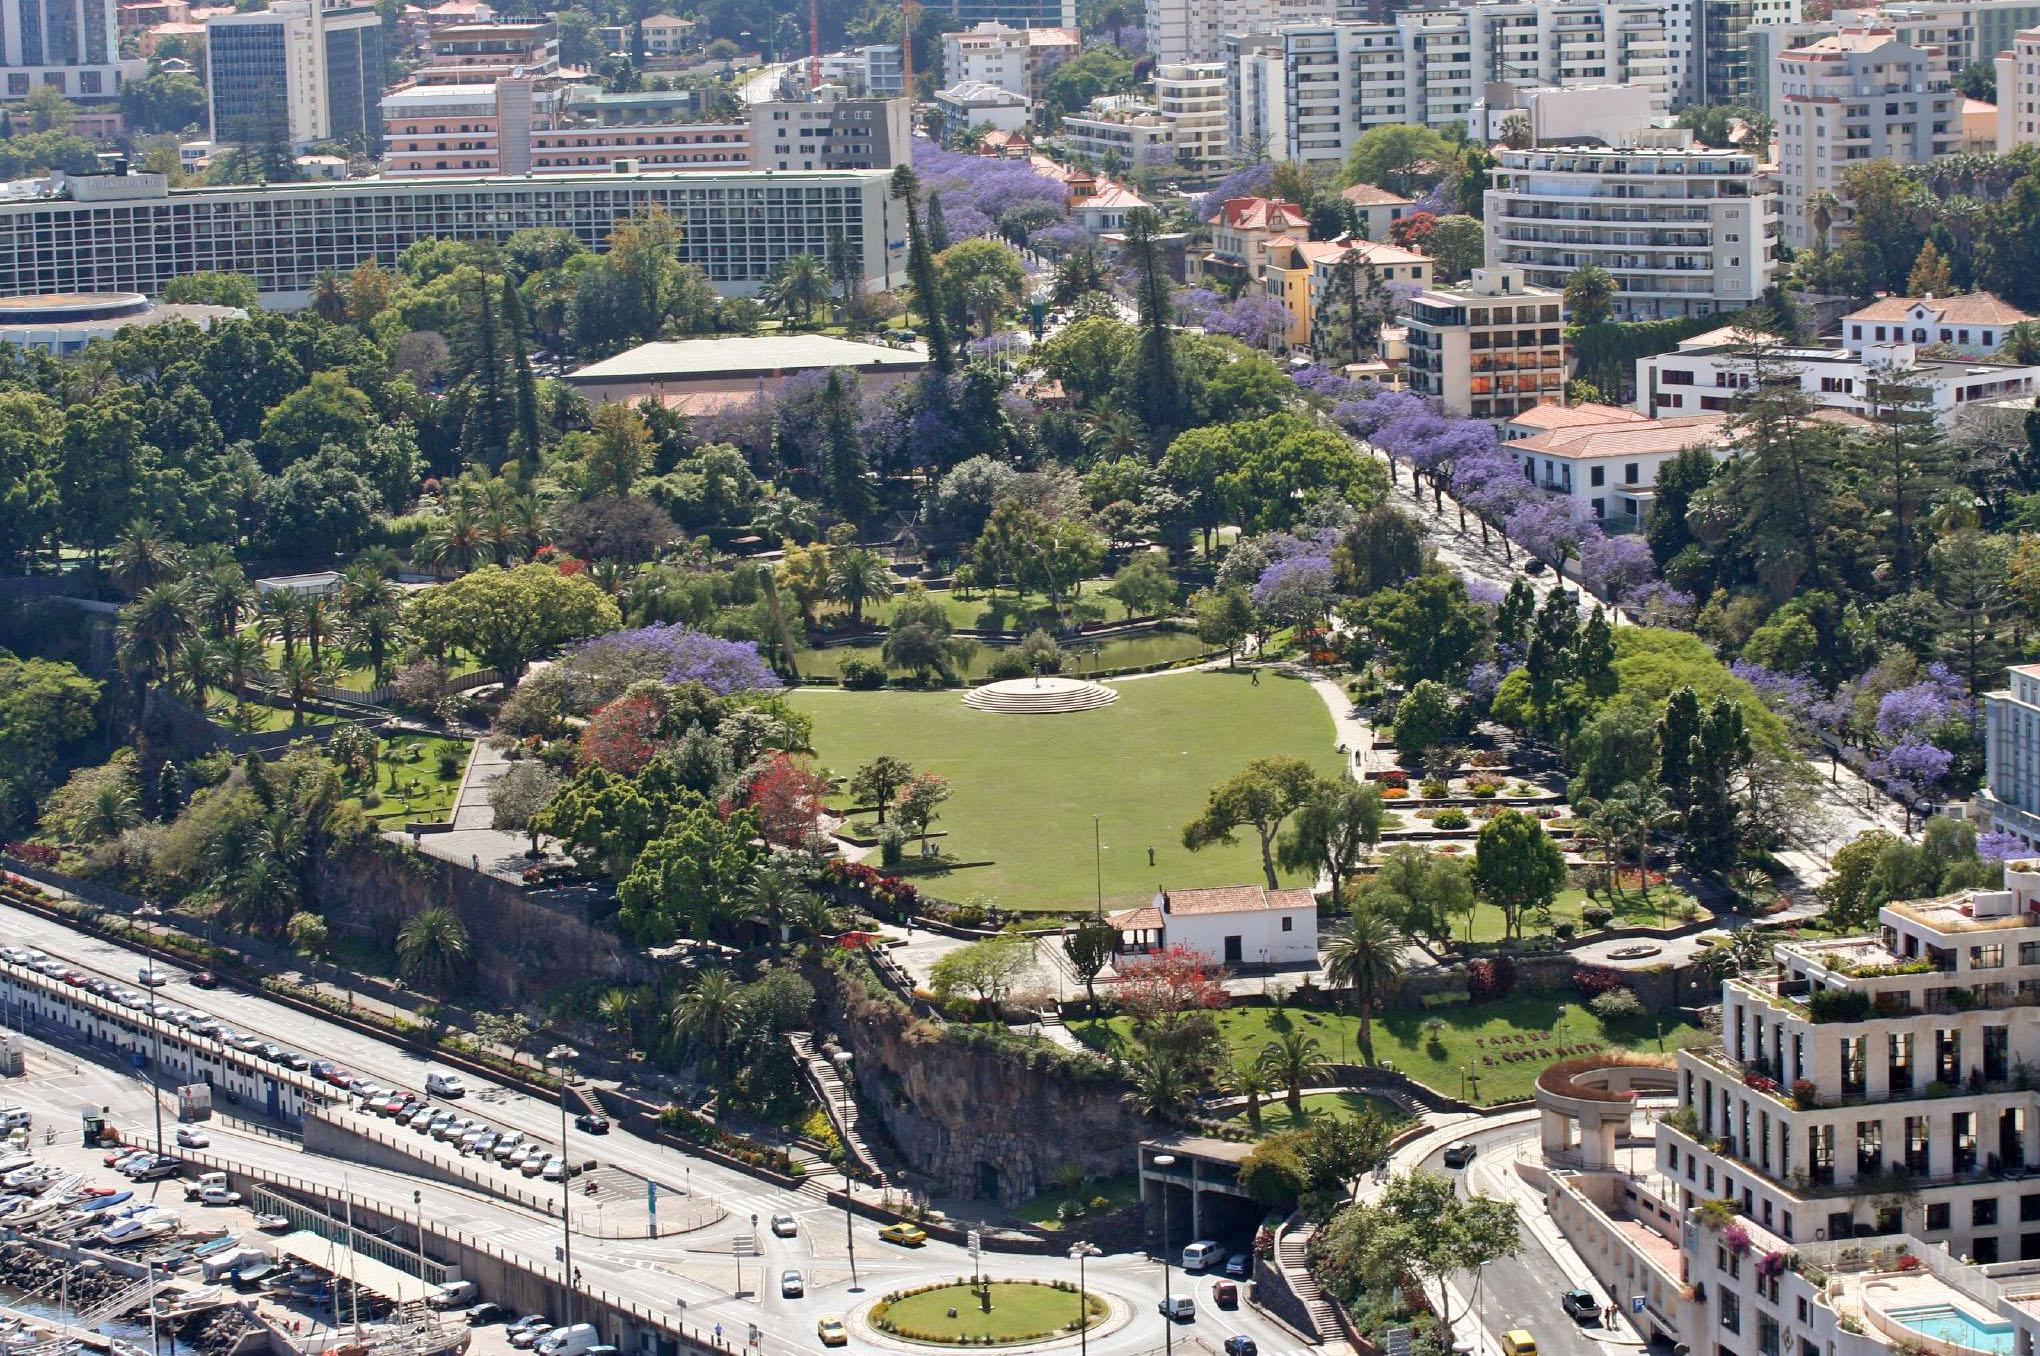 Santa Catarina Park